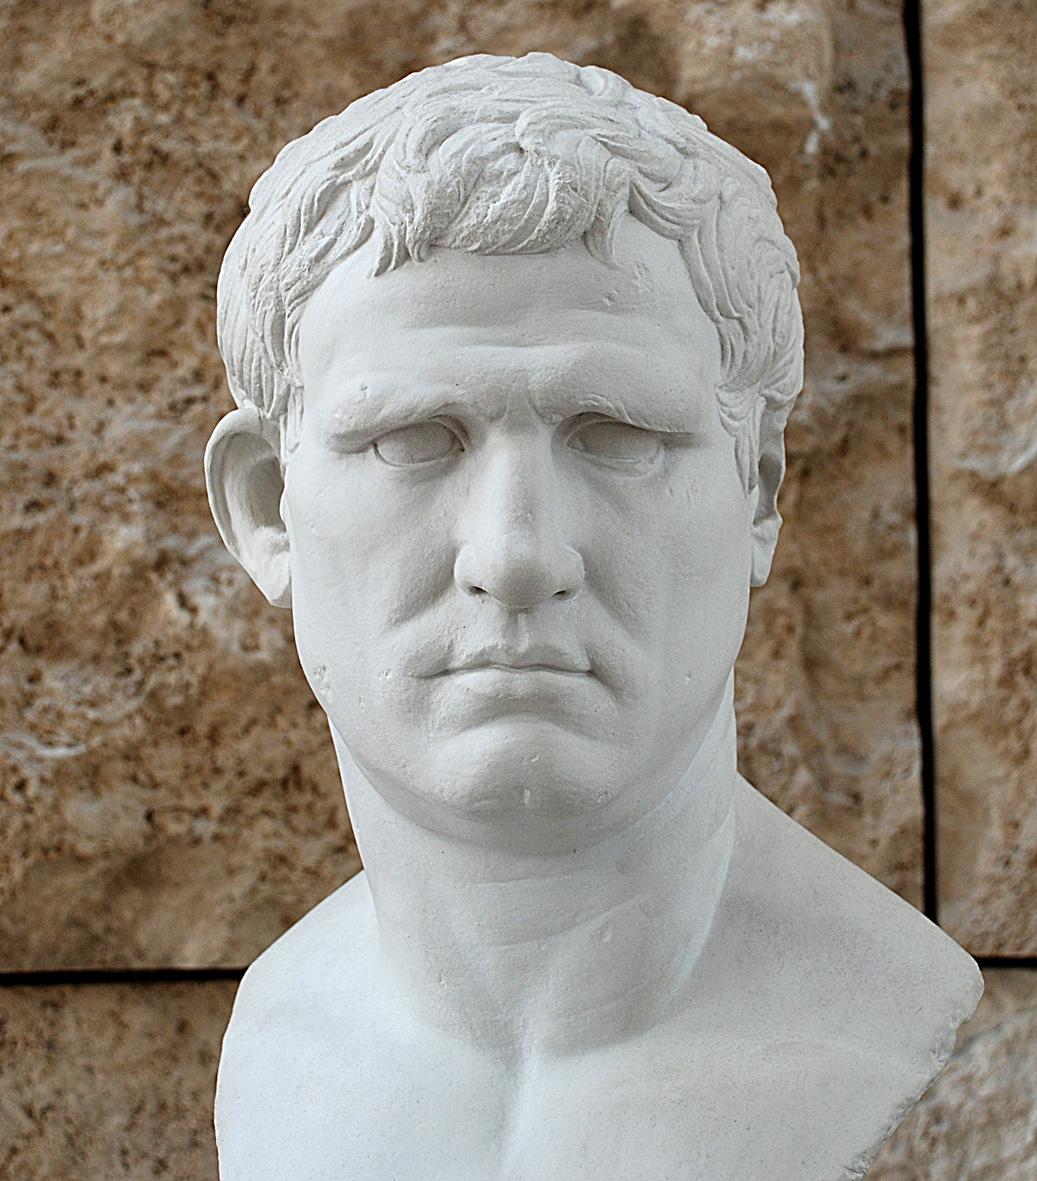 Agrippa And Maecenas Barbarism And Civilizationbarbarism